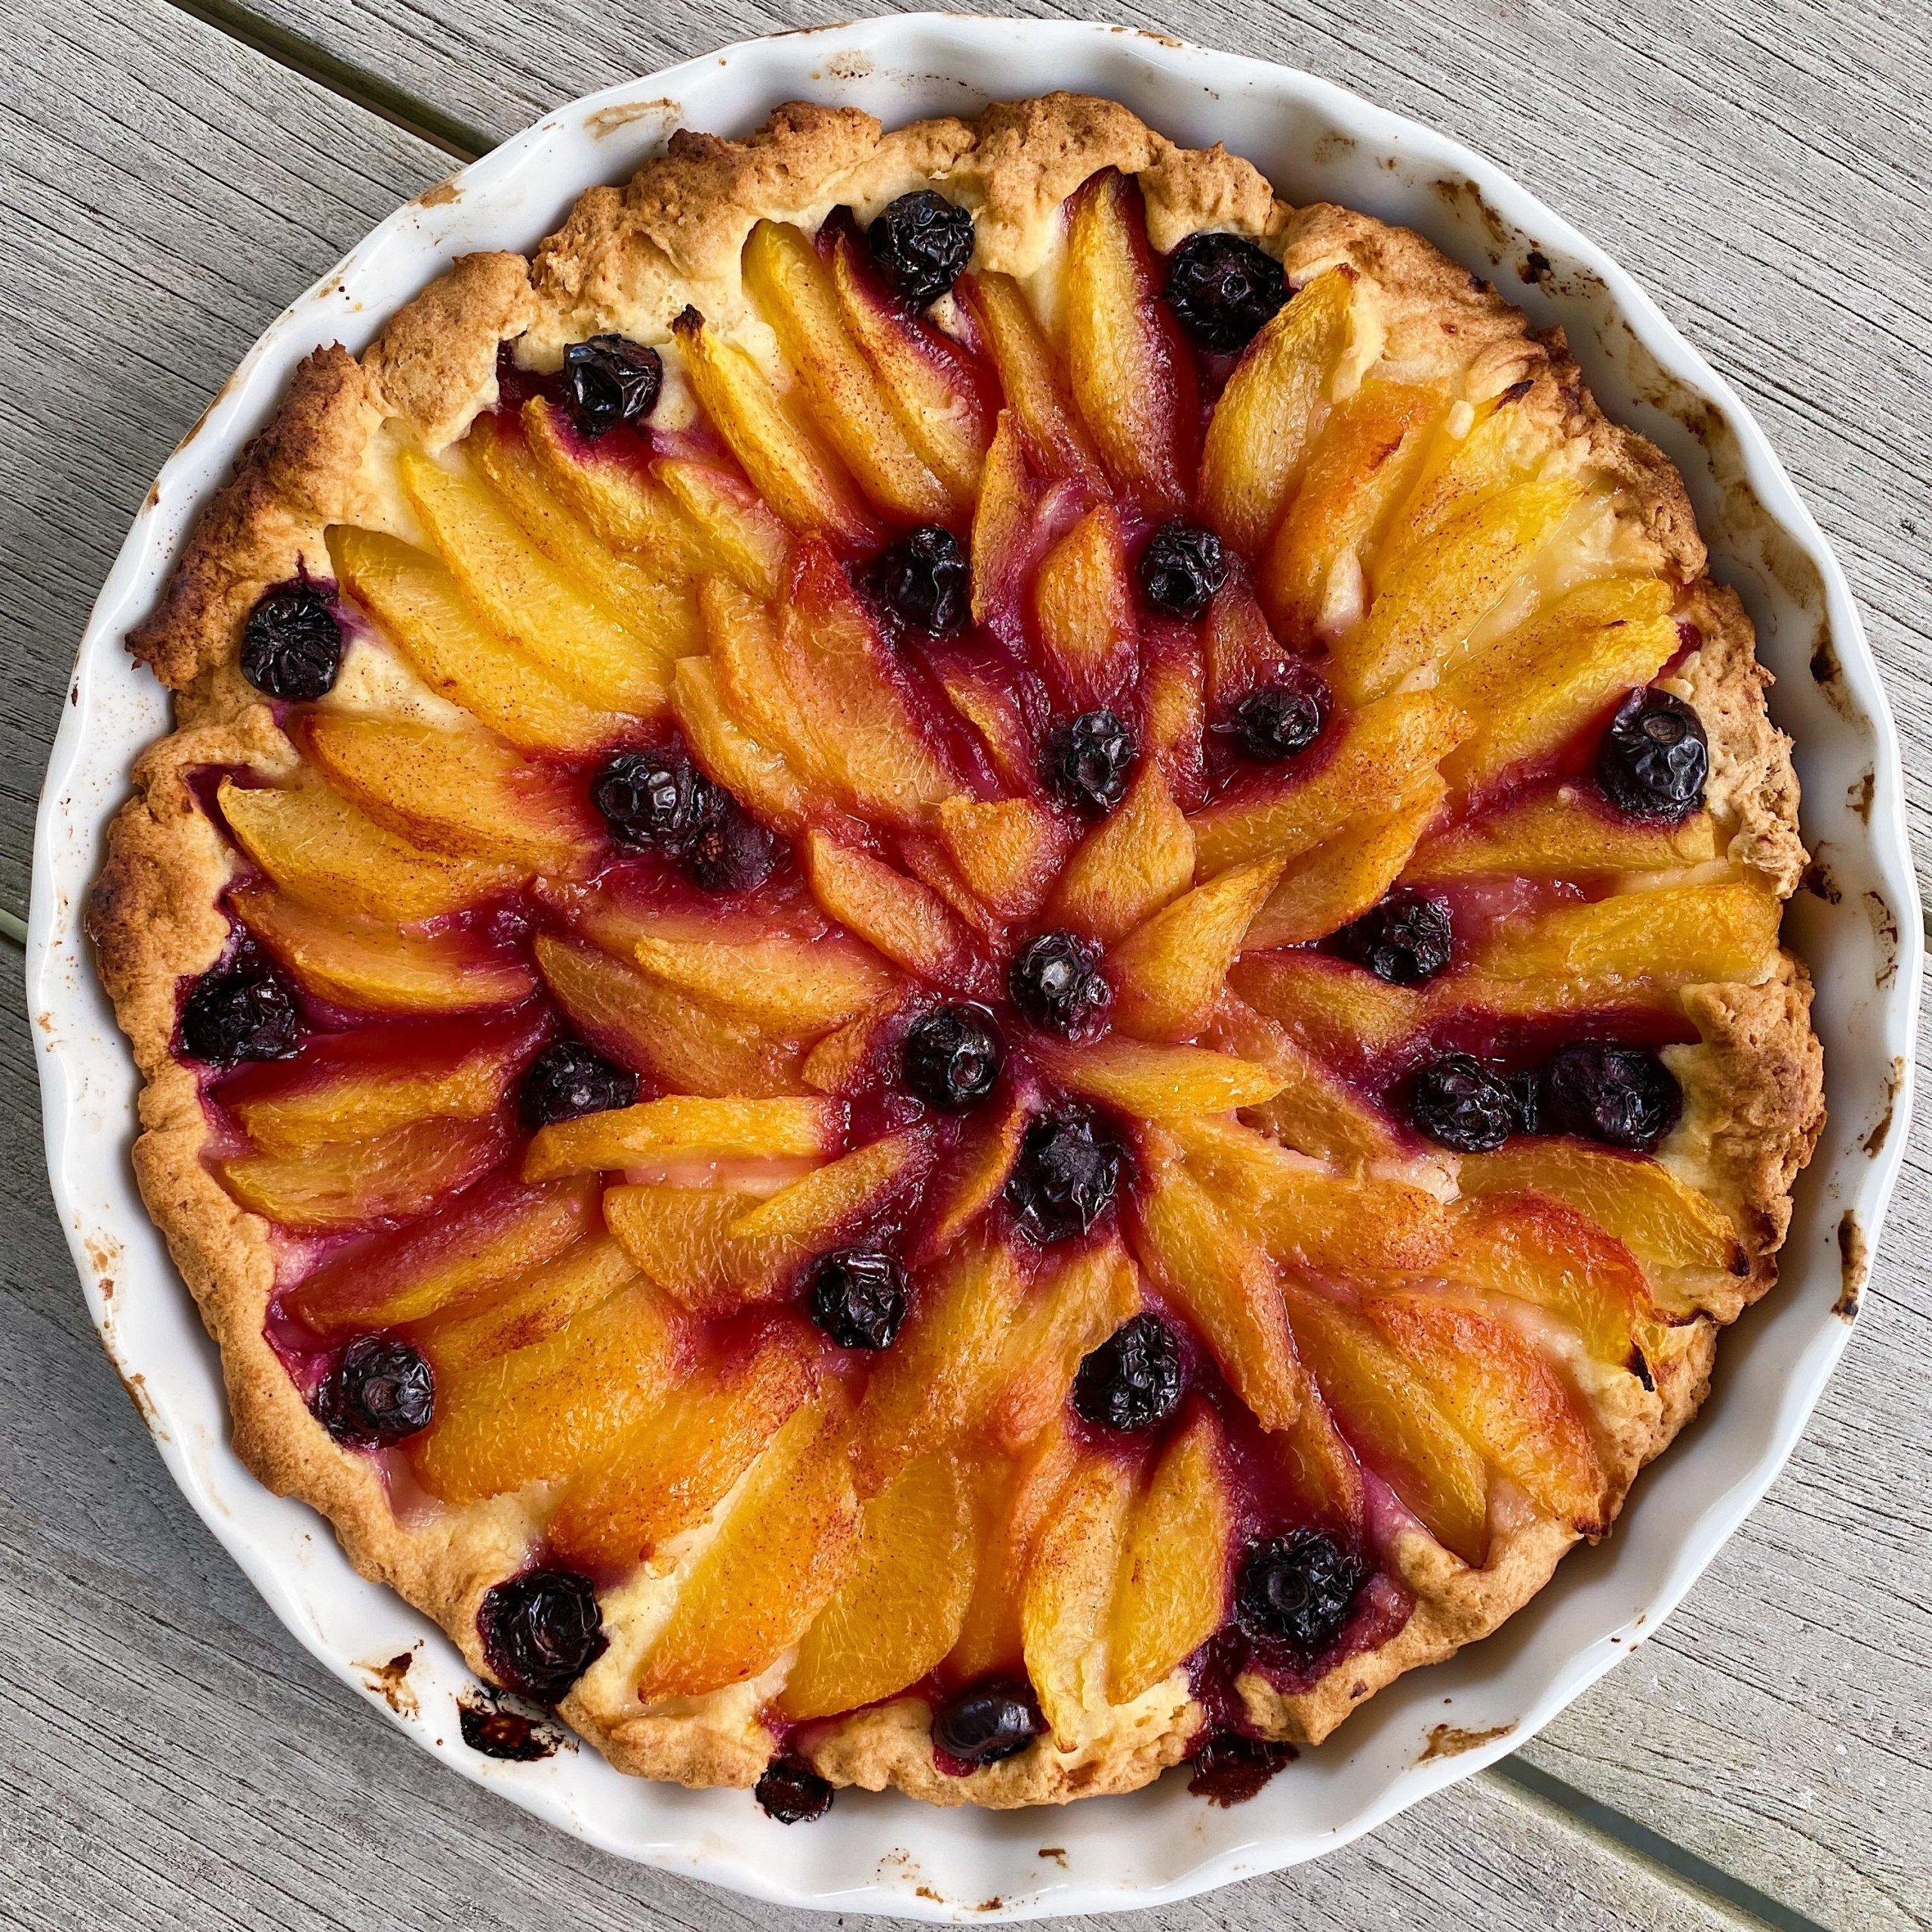 Gluten Free Dutch Peach Cake #glutenfree #glutenfreerecipes www.healthygffamily.com